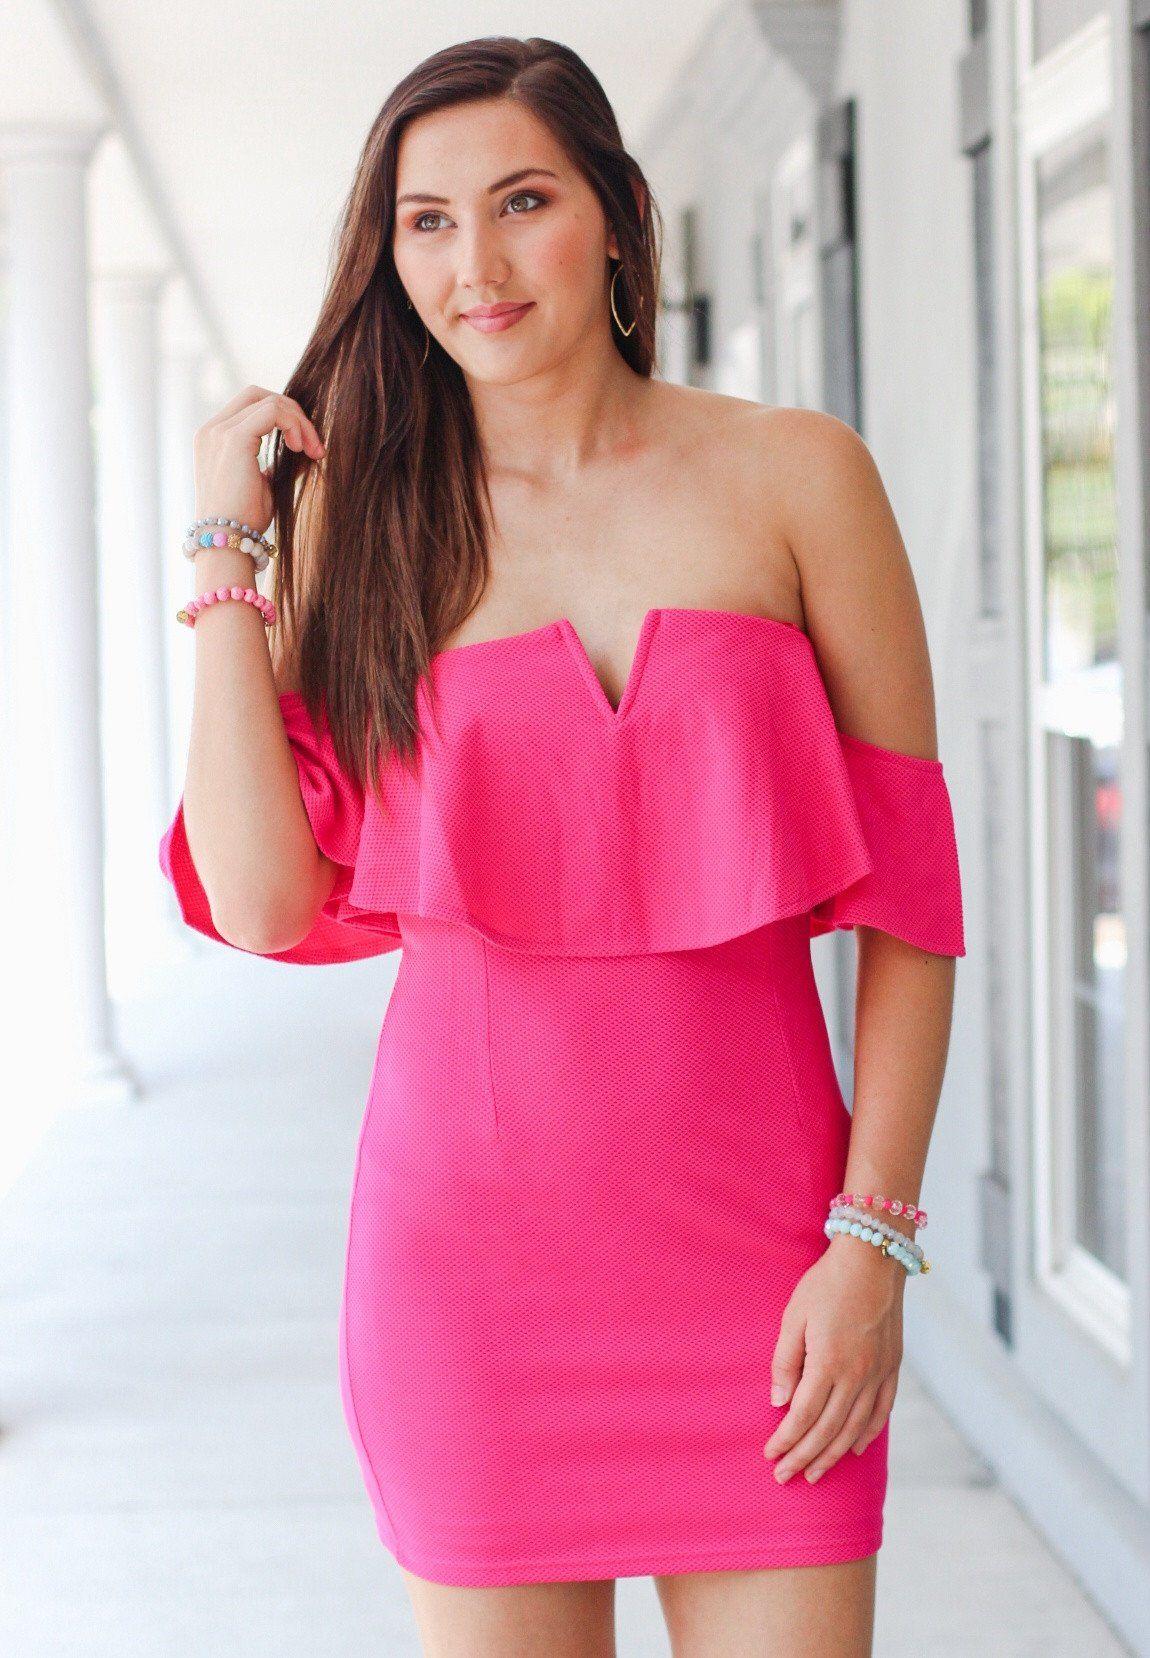 The Elle Woods Dress: Hot Pink